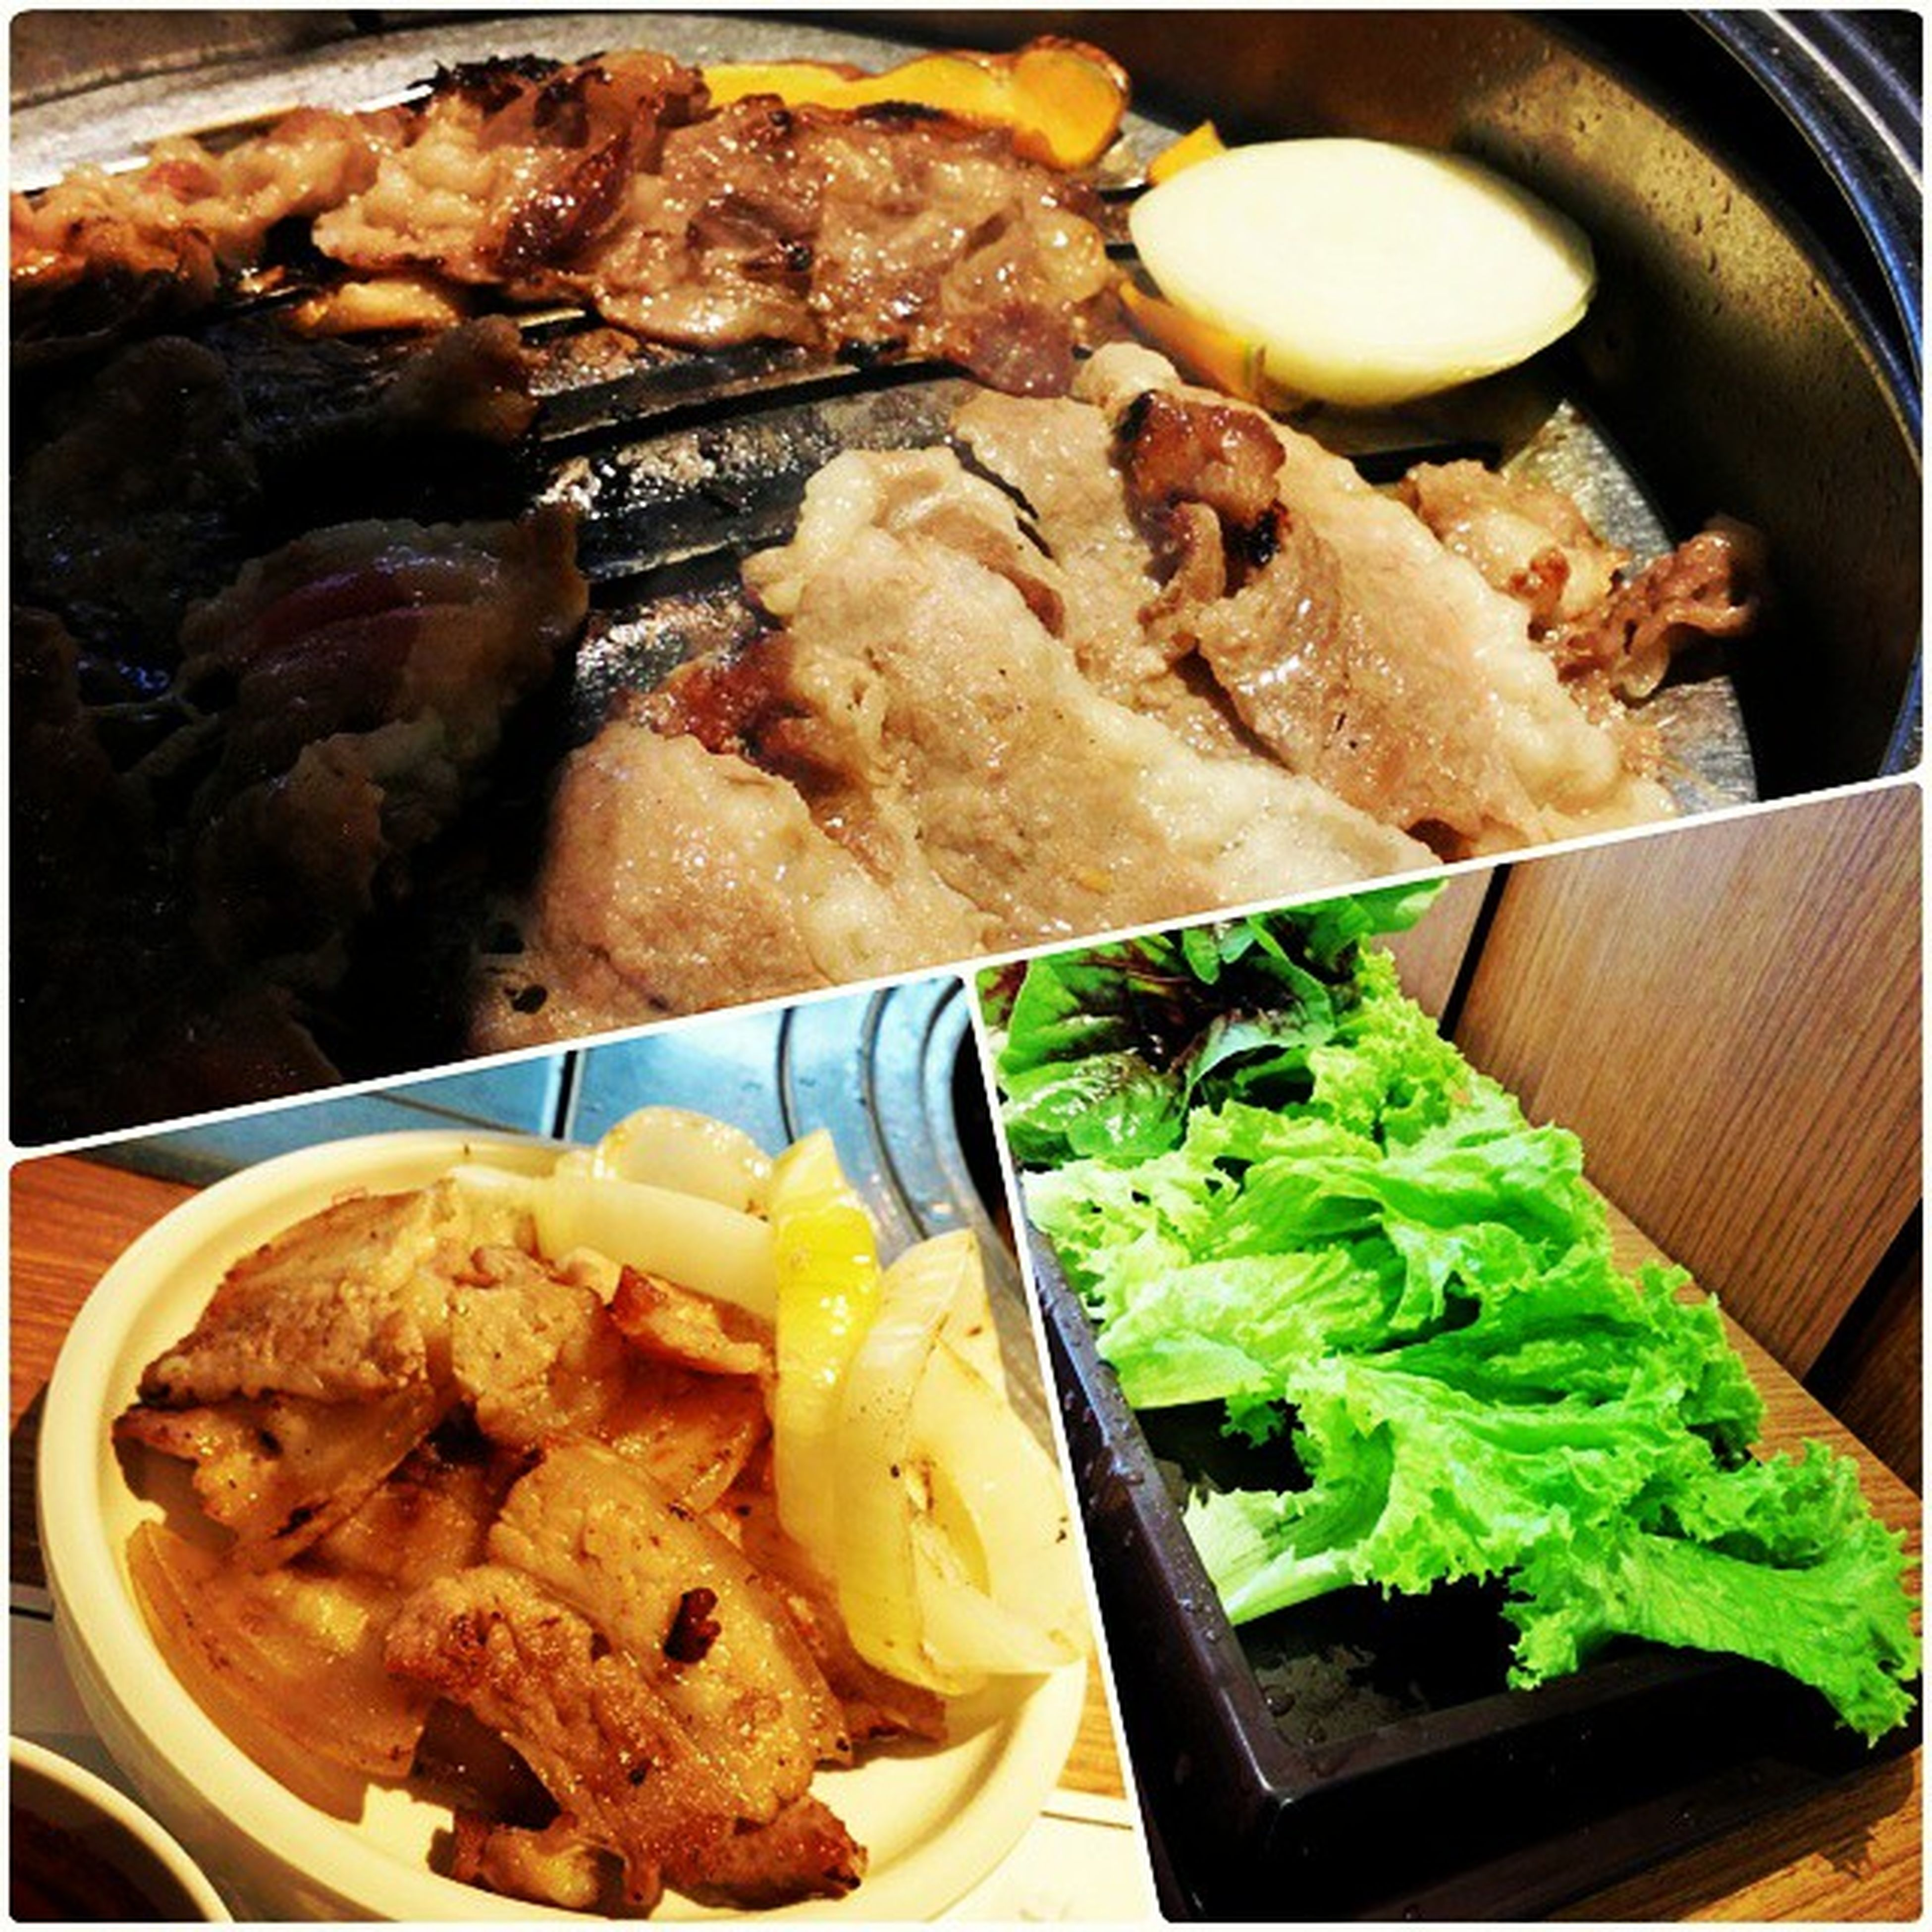 Bornga's signature Woo Samgyop& pork belly! Give me meat! Rawr! Burpple Bornga Starvista Borngastartvista porkbelly woosamyop koreanbbq